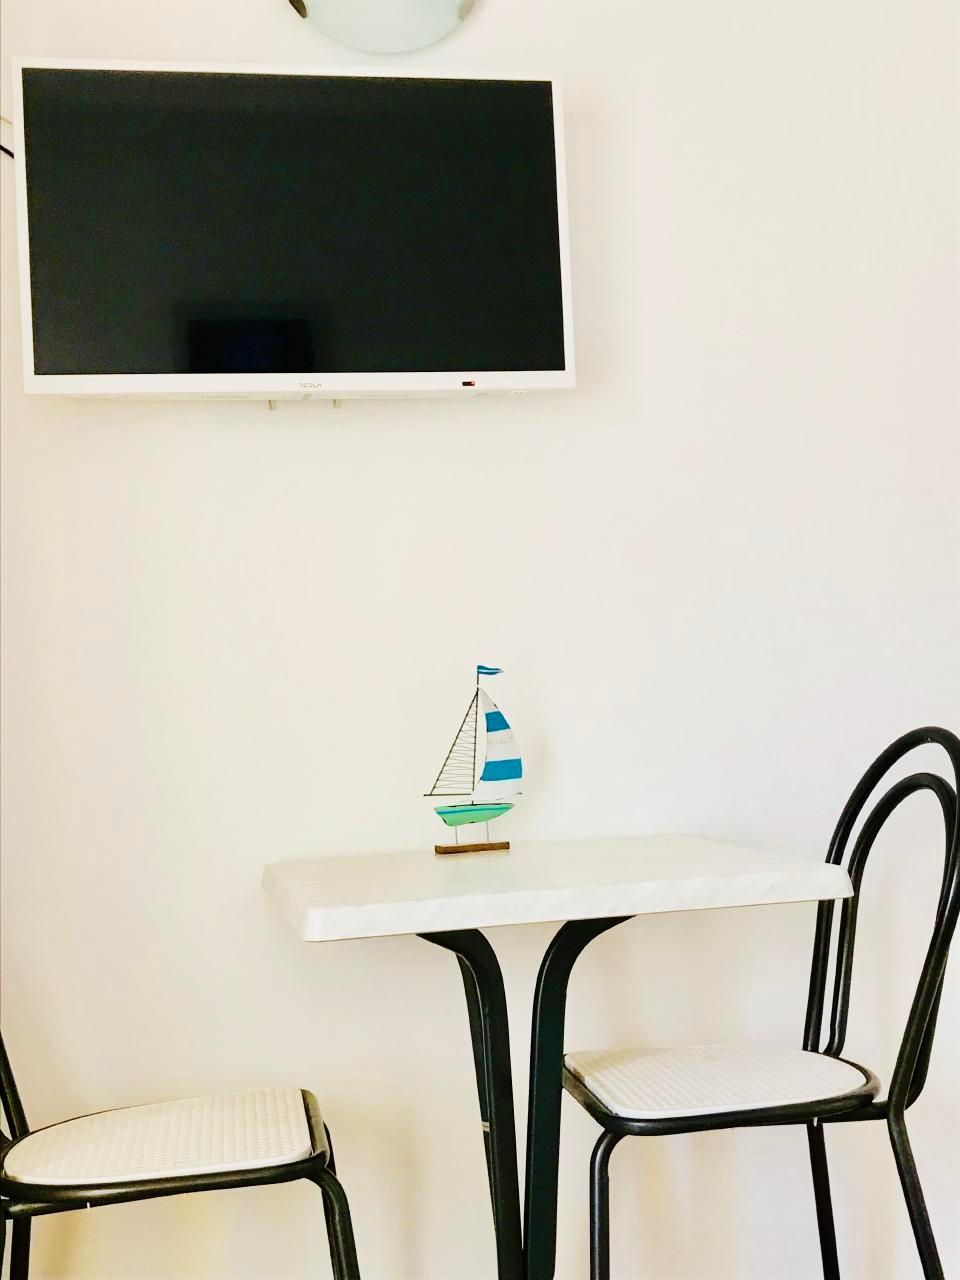 Ferienwohnung Apartmenthaus Ruza 6 - Apartment (98382), Kaštel Štafilić, , Dalmatien, Kroatien, Bild 23